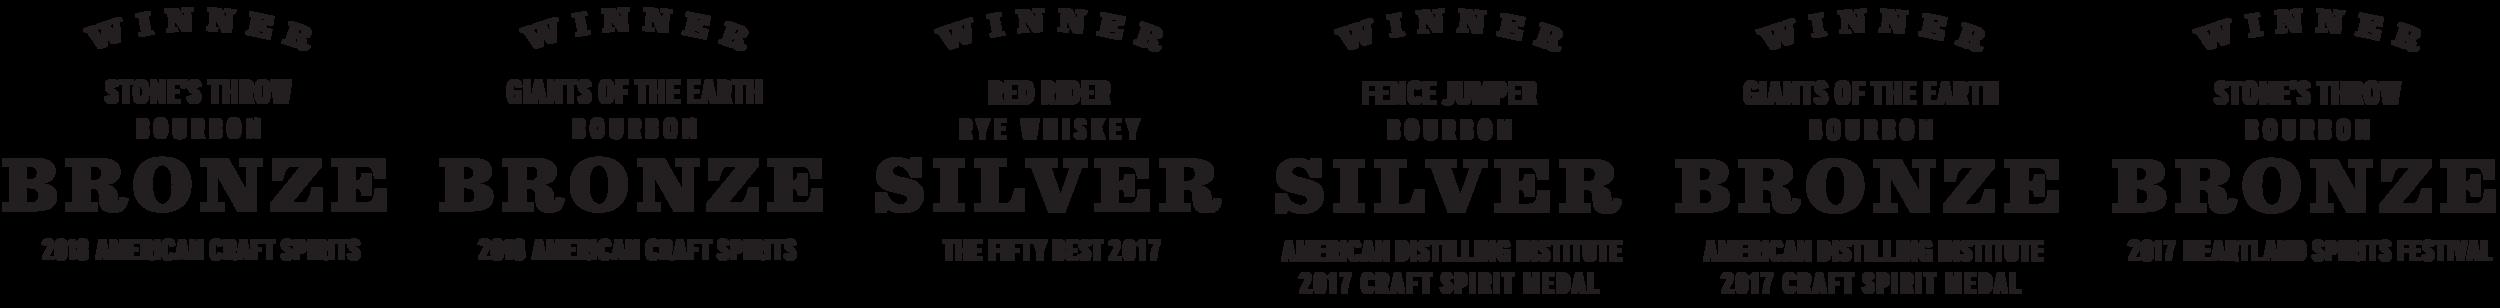 RockFilter Award-Winning Bourbons